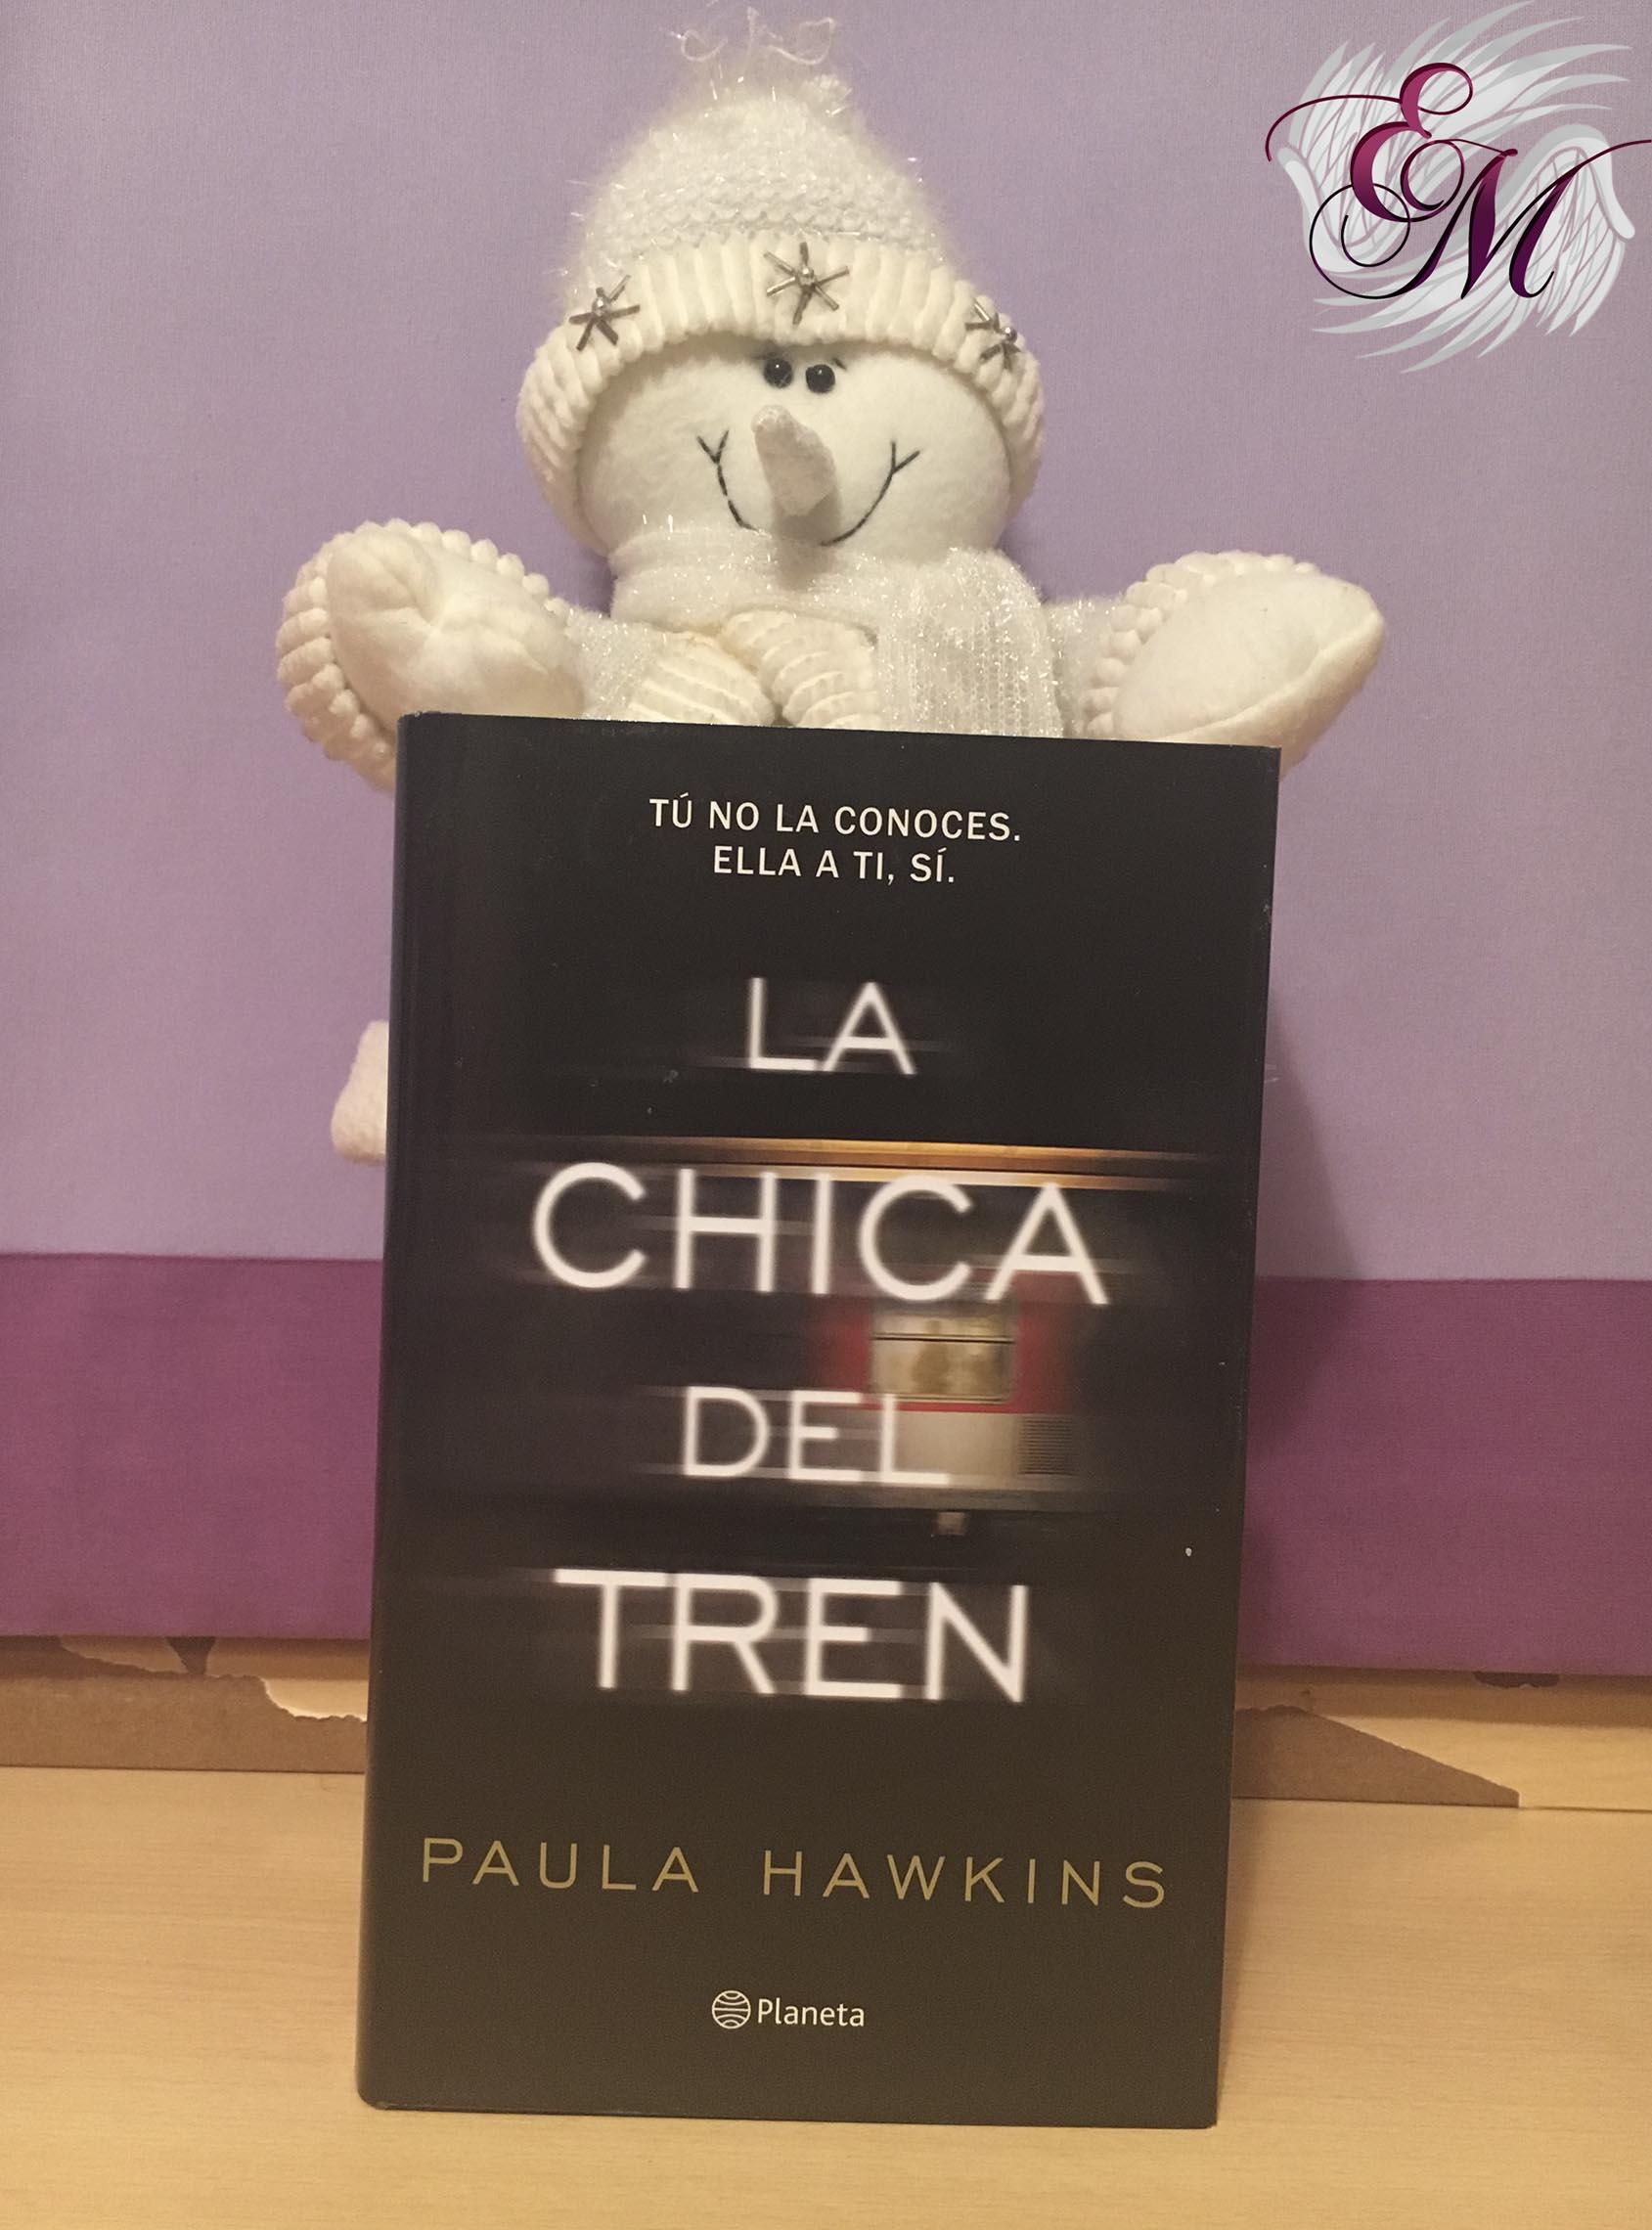 La chica del tren, de Paula Hawkins - Reseña